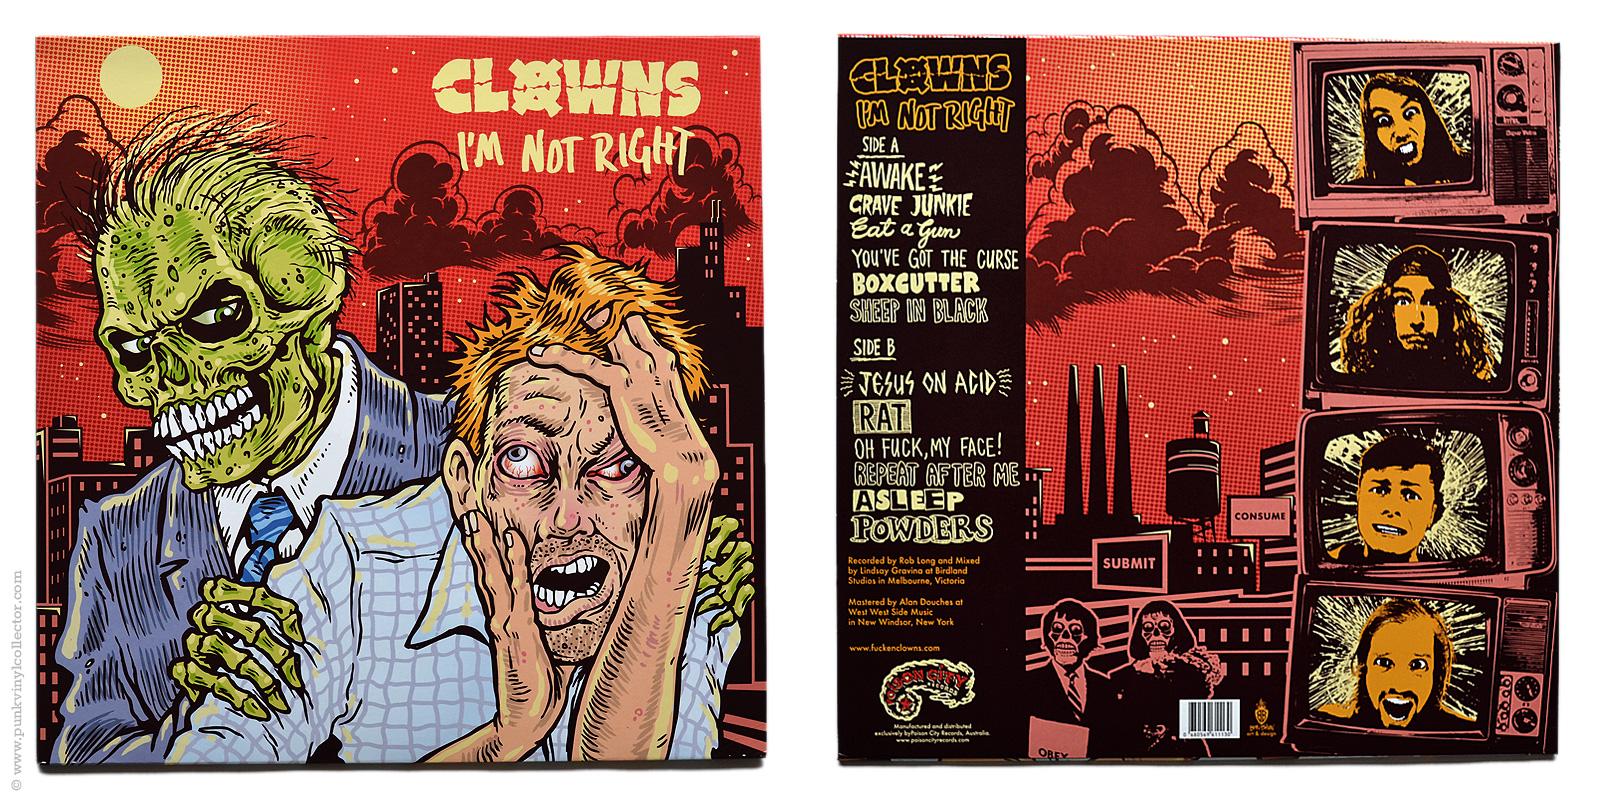 Clowns Punk Vinyl Collector